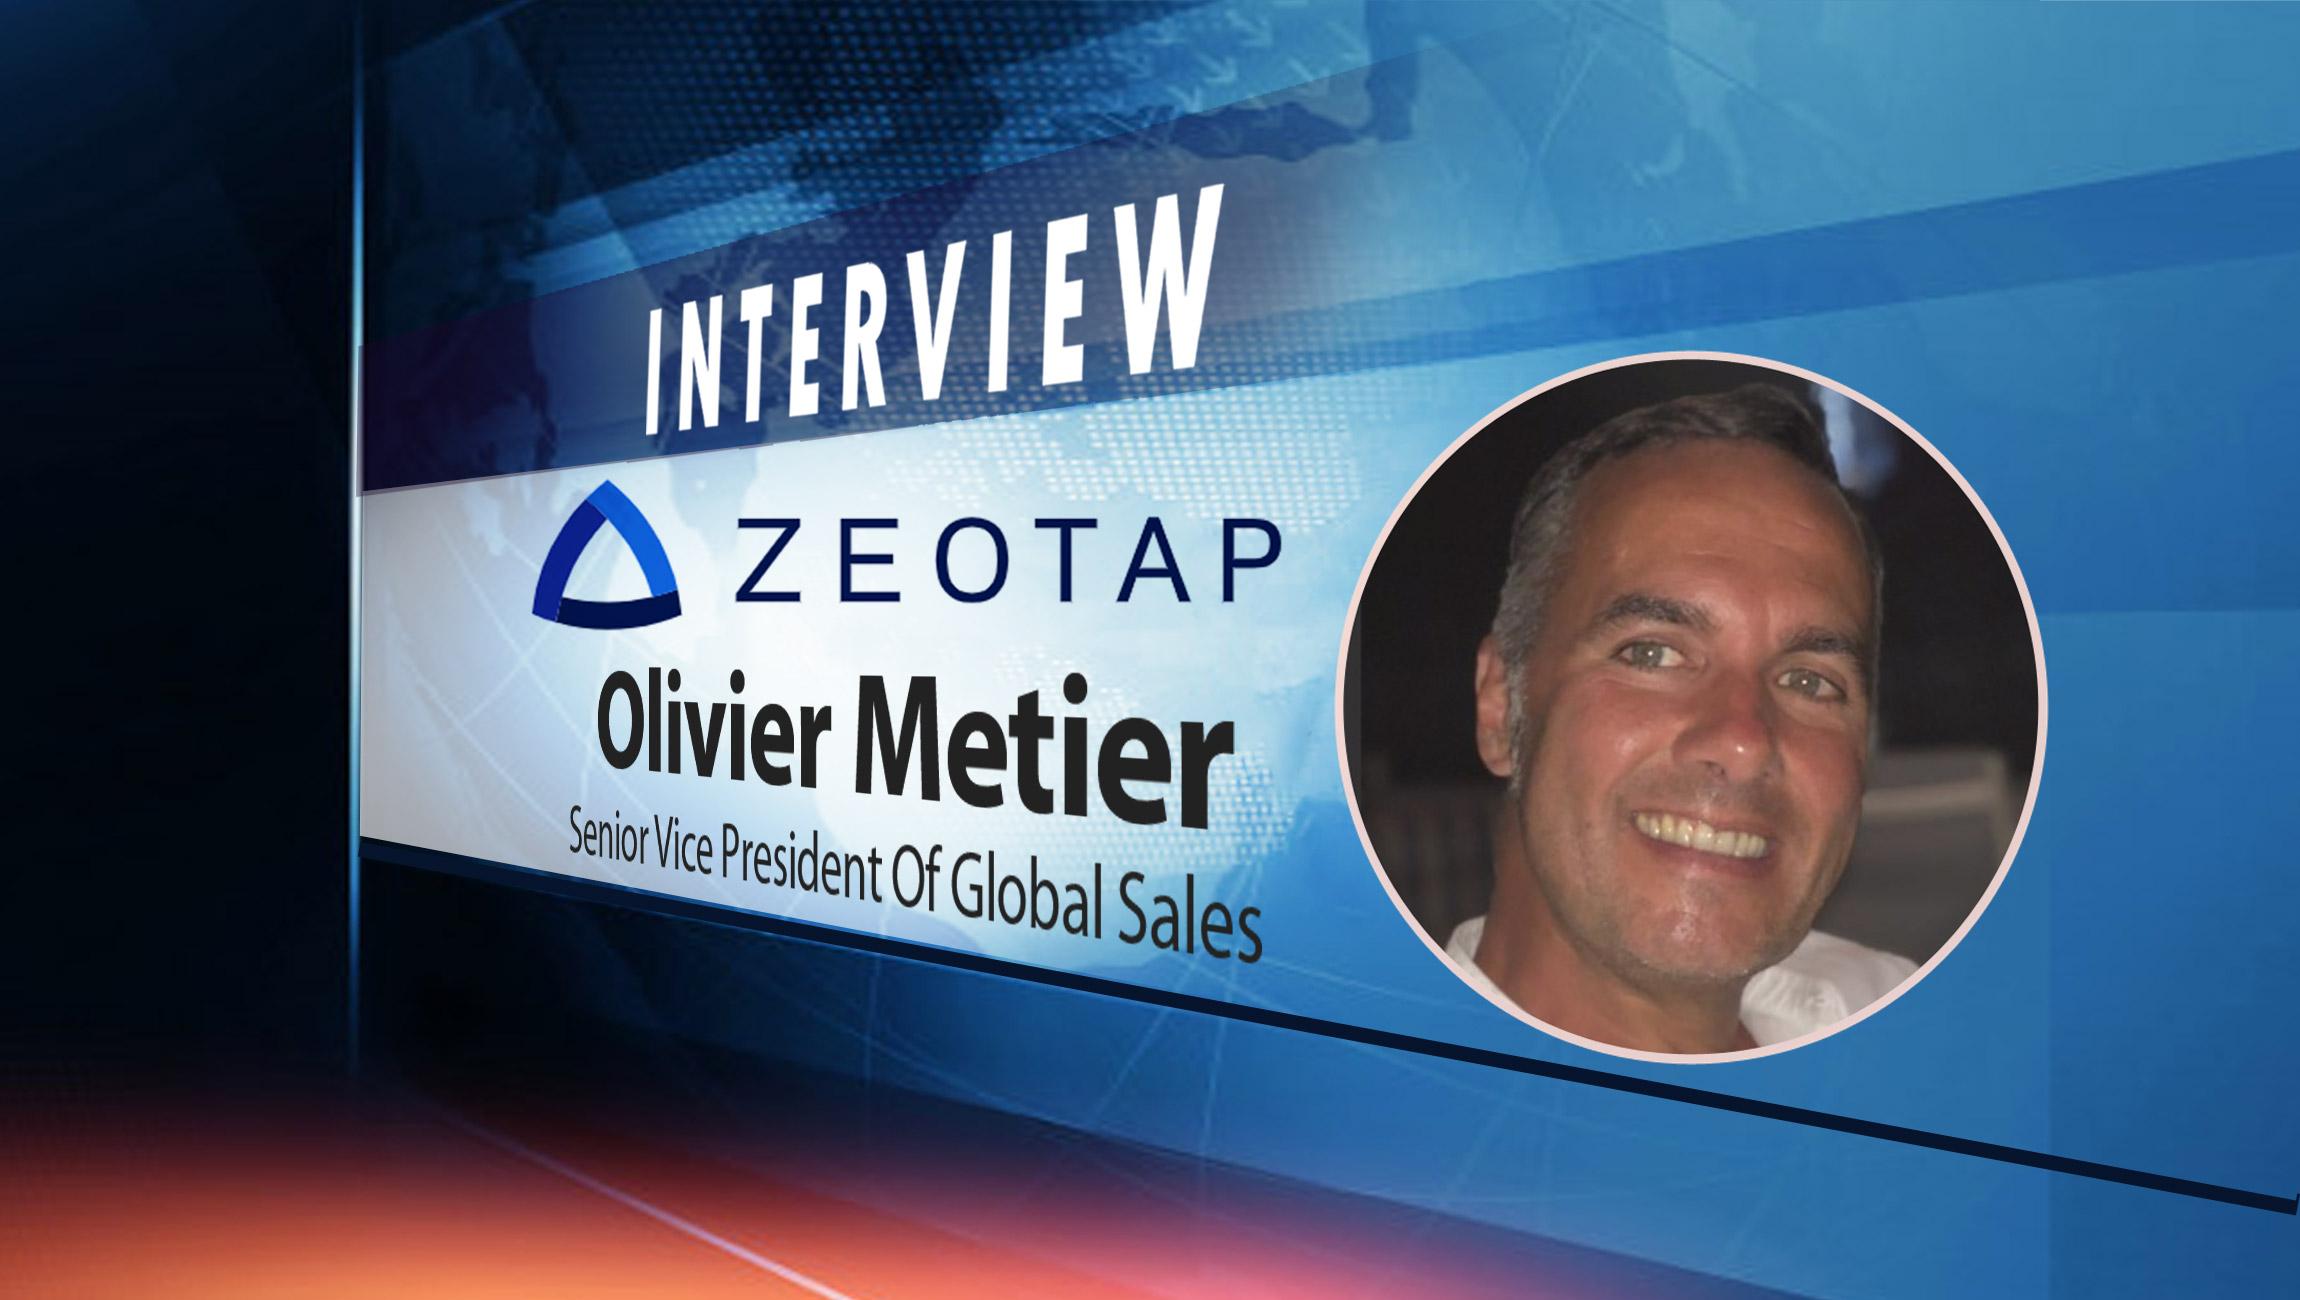 SalesTechStar Interview with Olivier Metier, Senior Vice President Of Global Sales at Zeotap